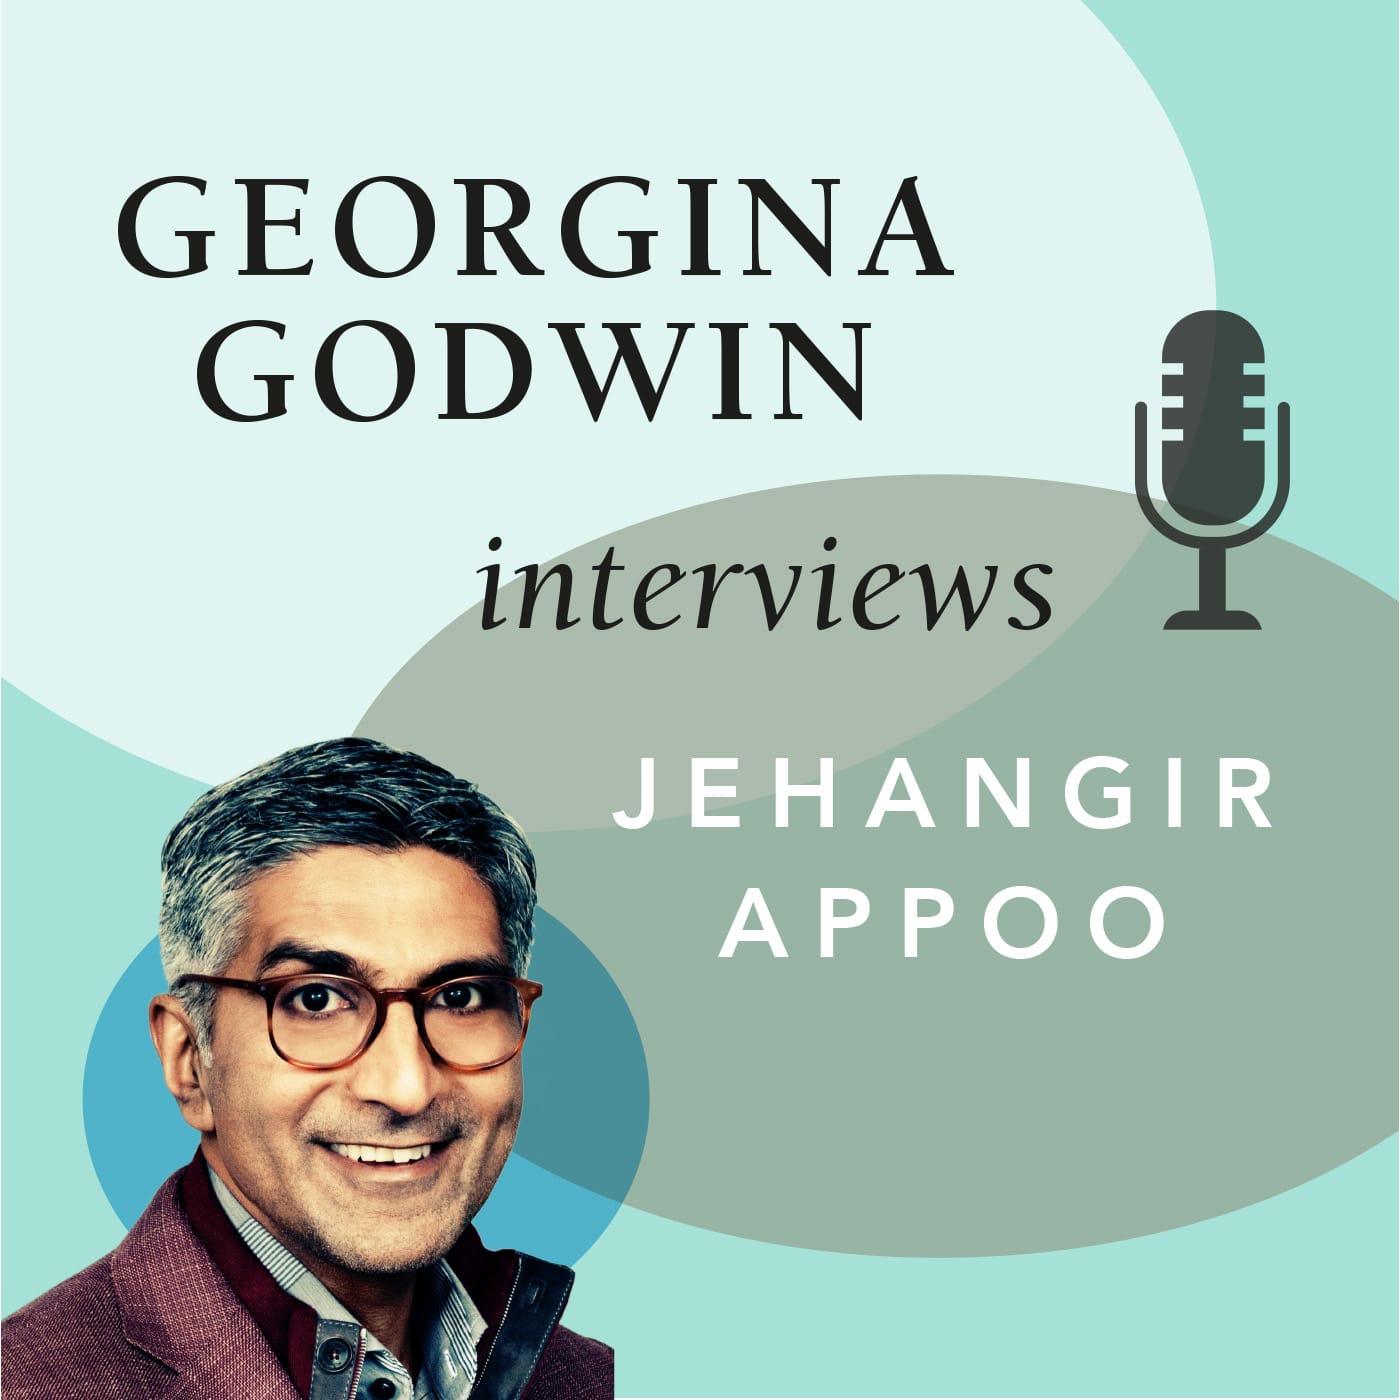 Georgina Godwin interviews Jehangir Appoo